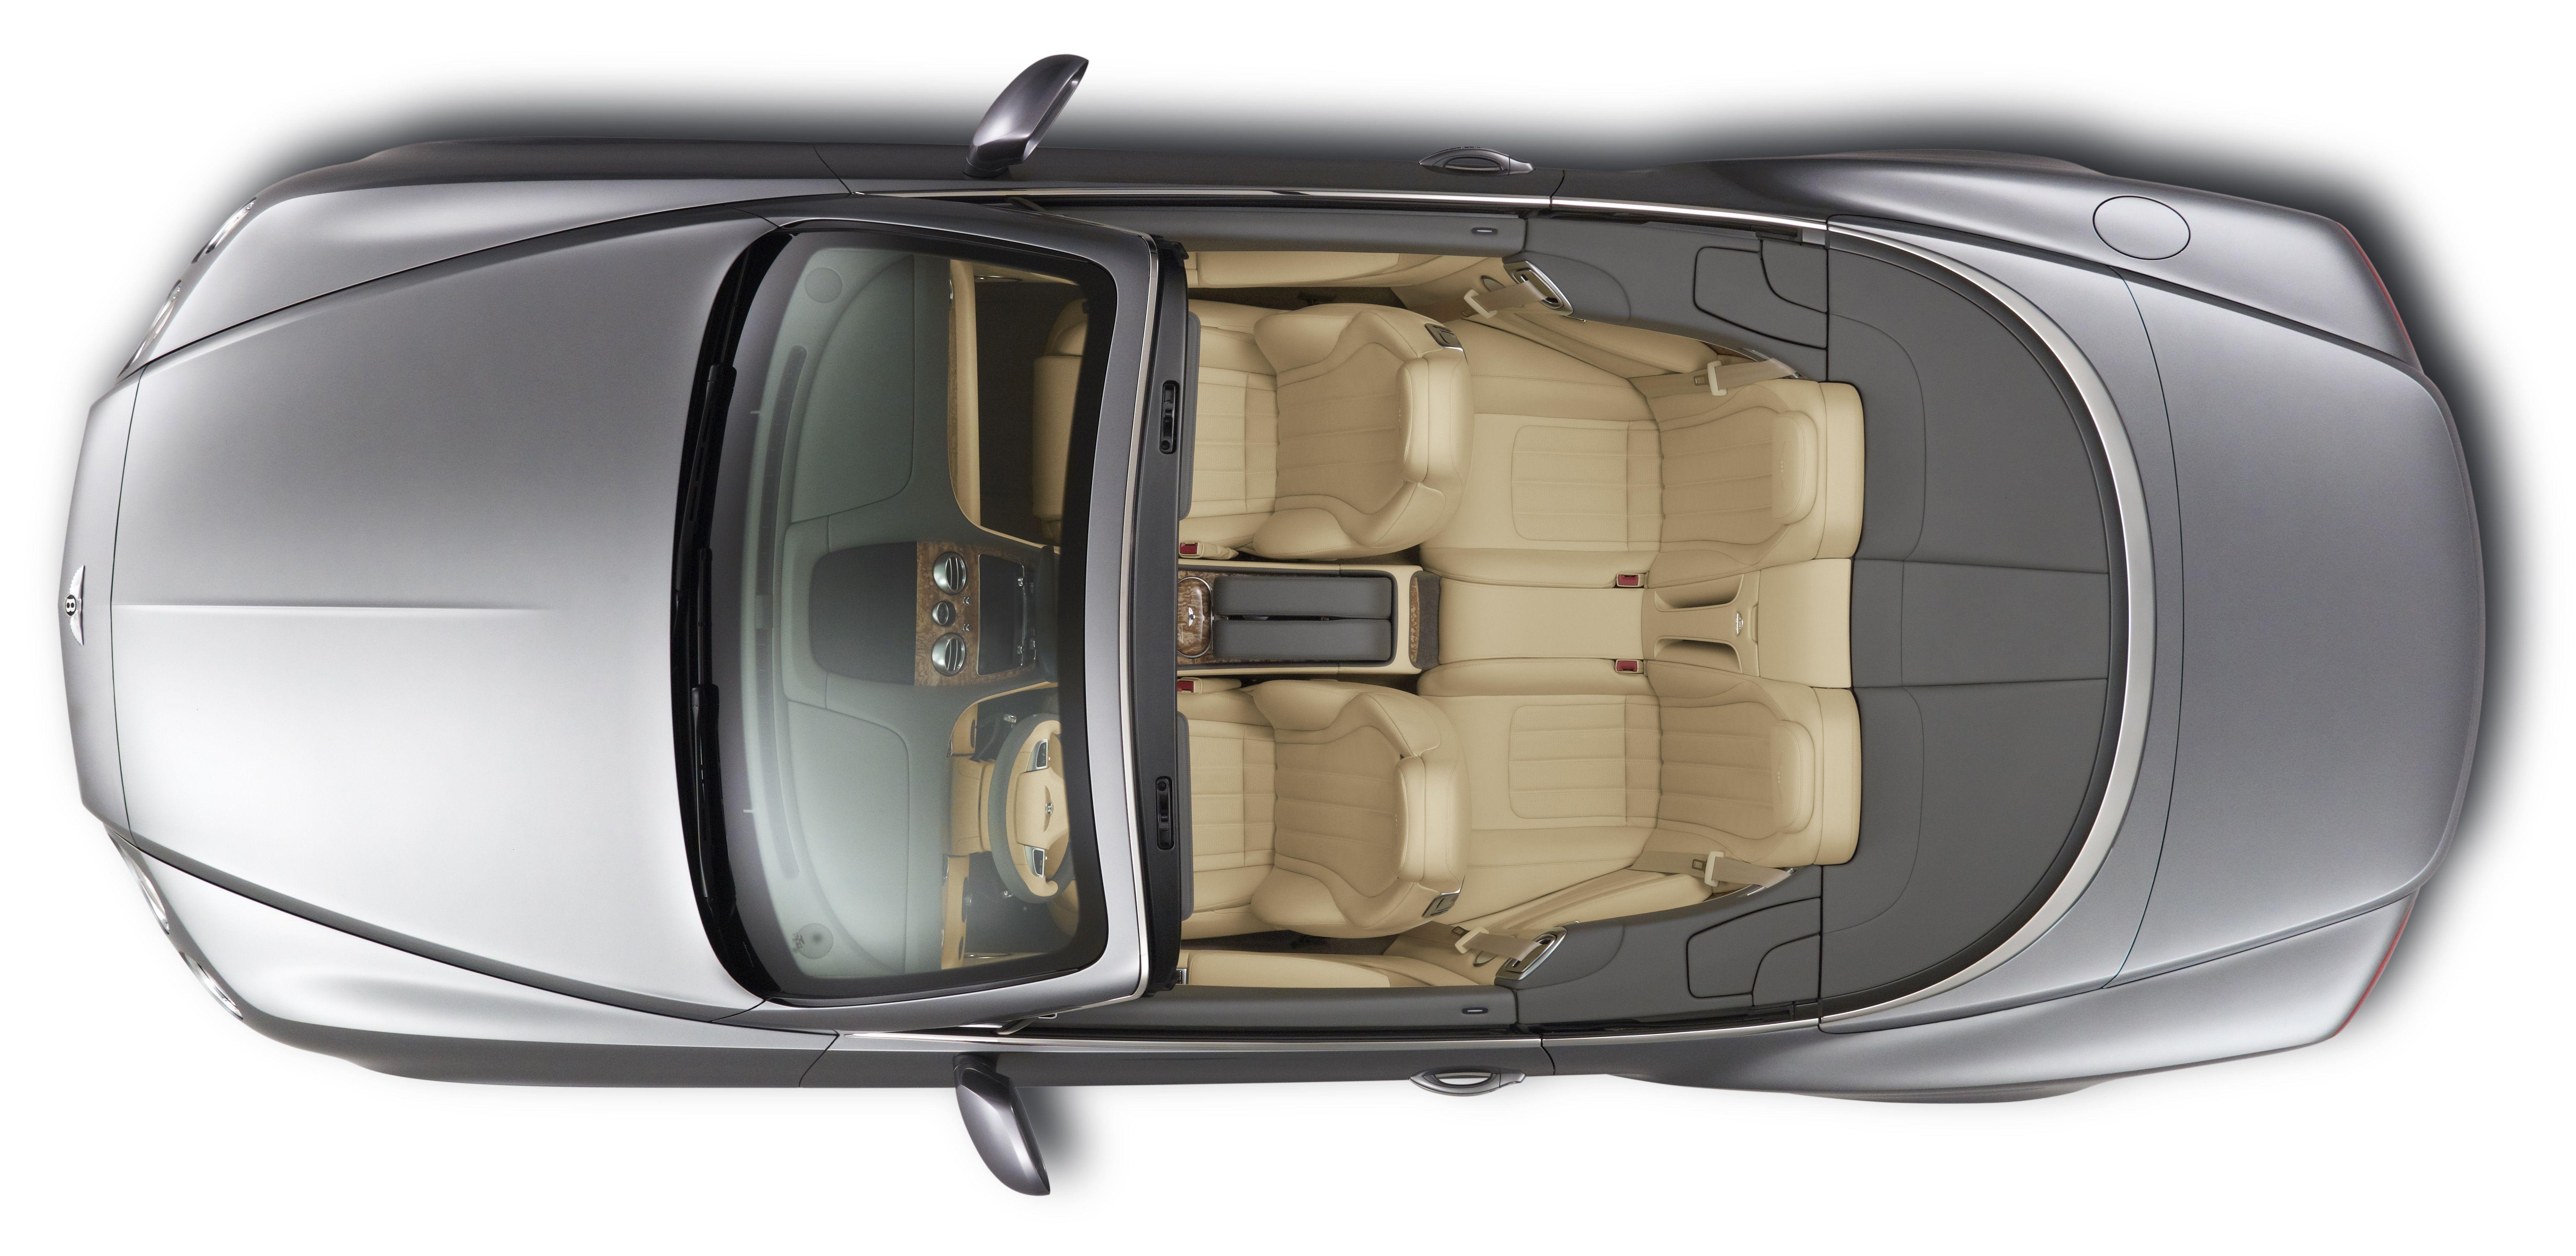 car view car top view png plan view png plans sketches models masterplans ergonomics interior. Black Bedroom Furniture Sets. Home Design Ideas